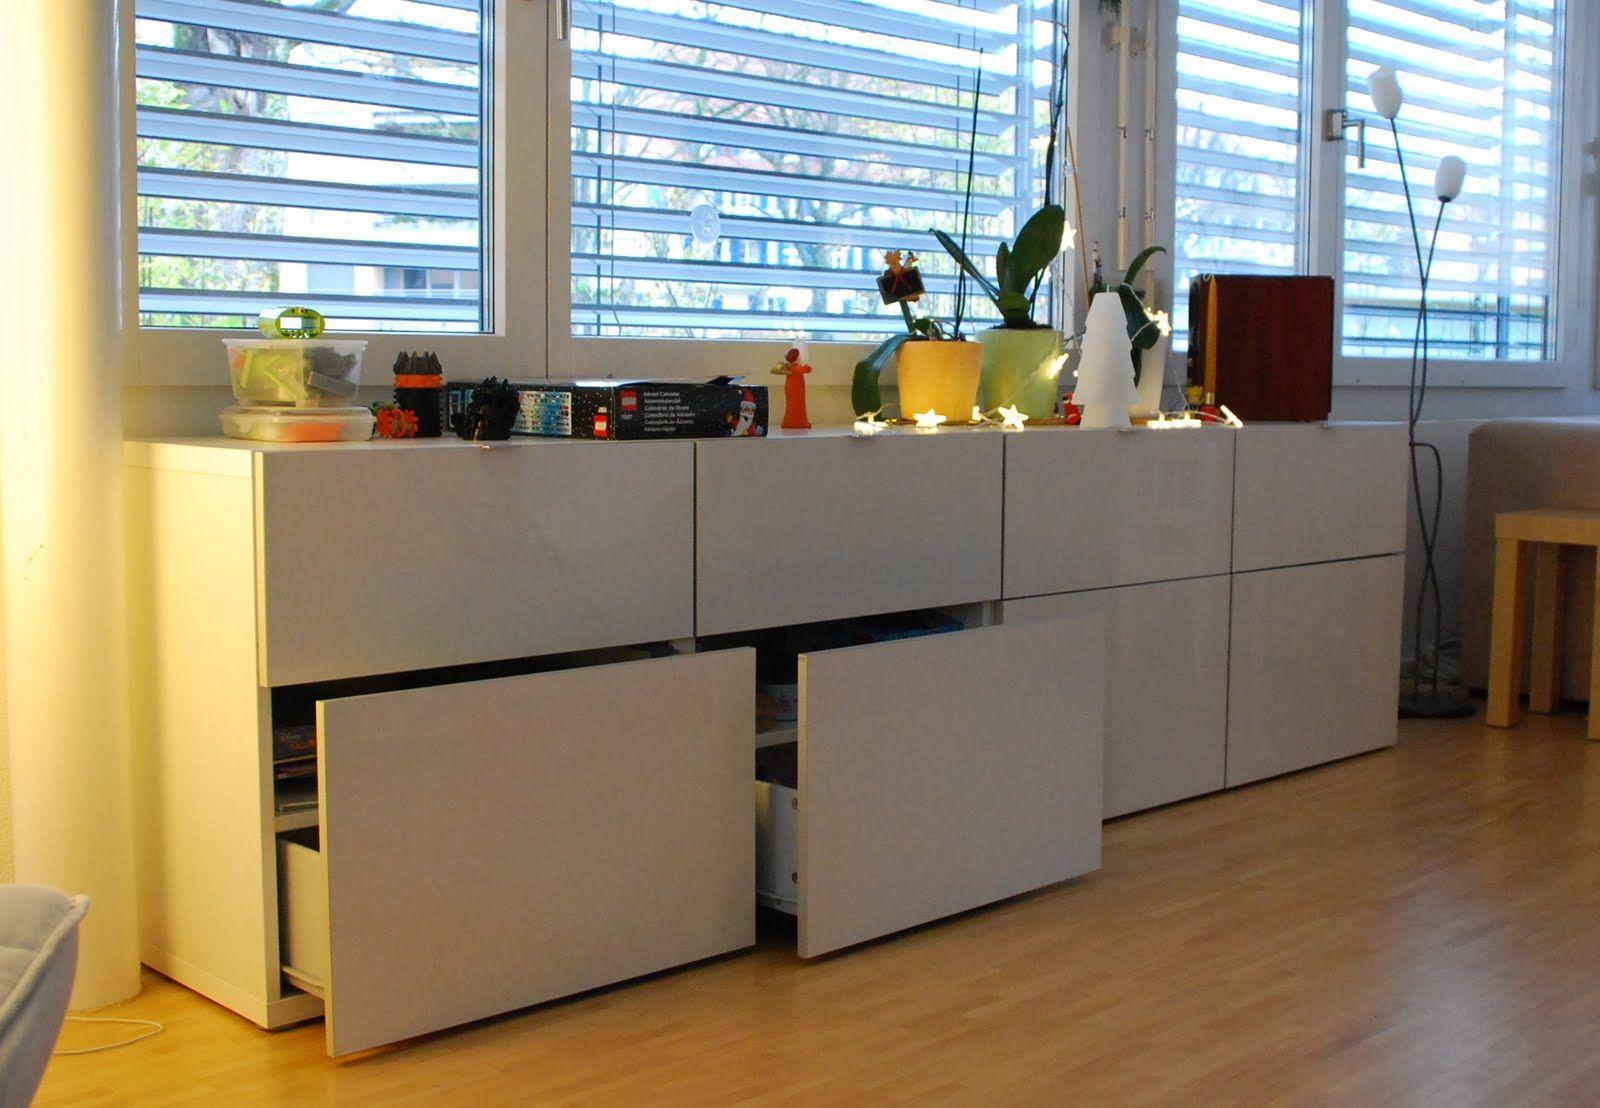 ikea hack besta vattern a ade al caj n sin frente una puerta deco ikea hacks. Black Bedroom Furniture Sets. Home Design Ideas